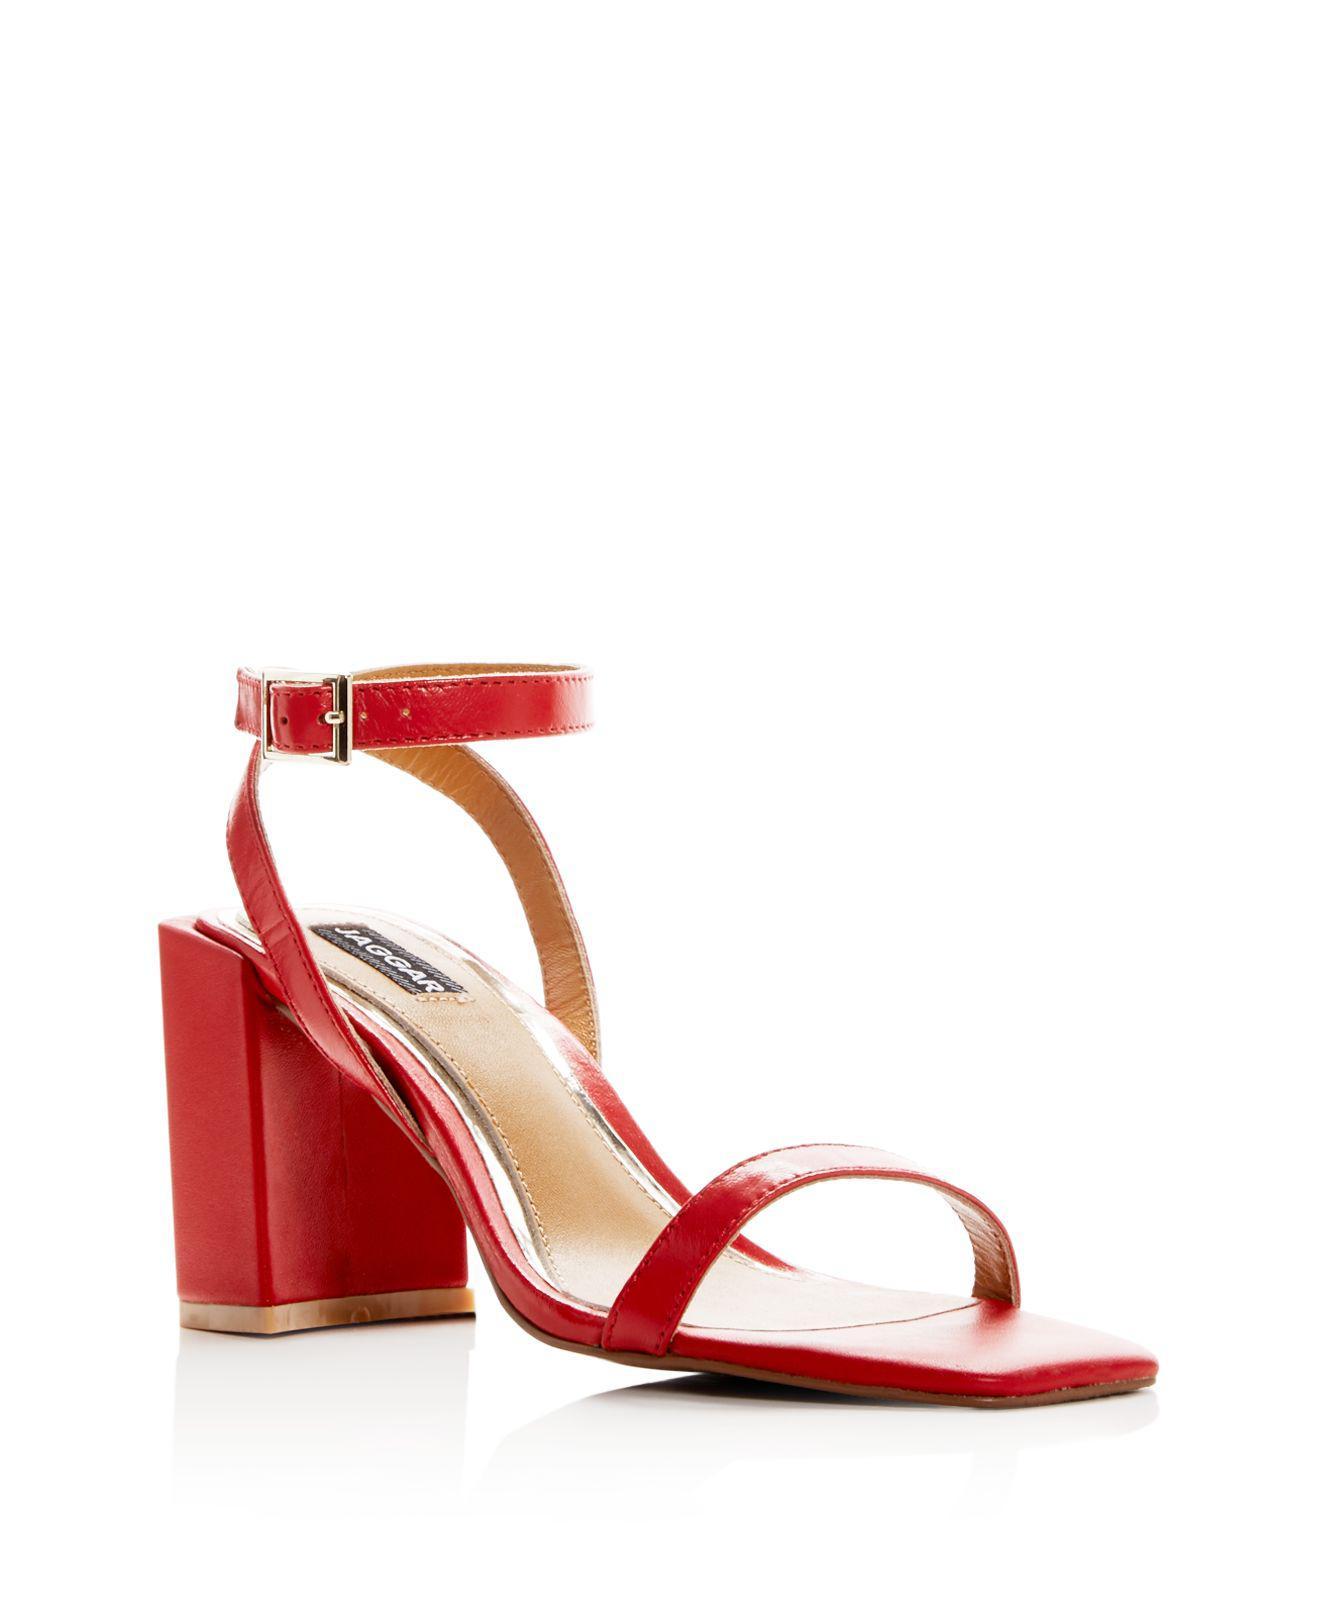 JAGGAR Women's Squared Leather Block Heel Sandals gkTyiycD